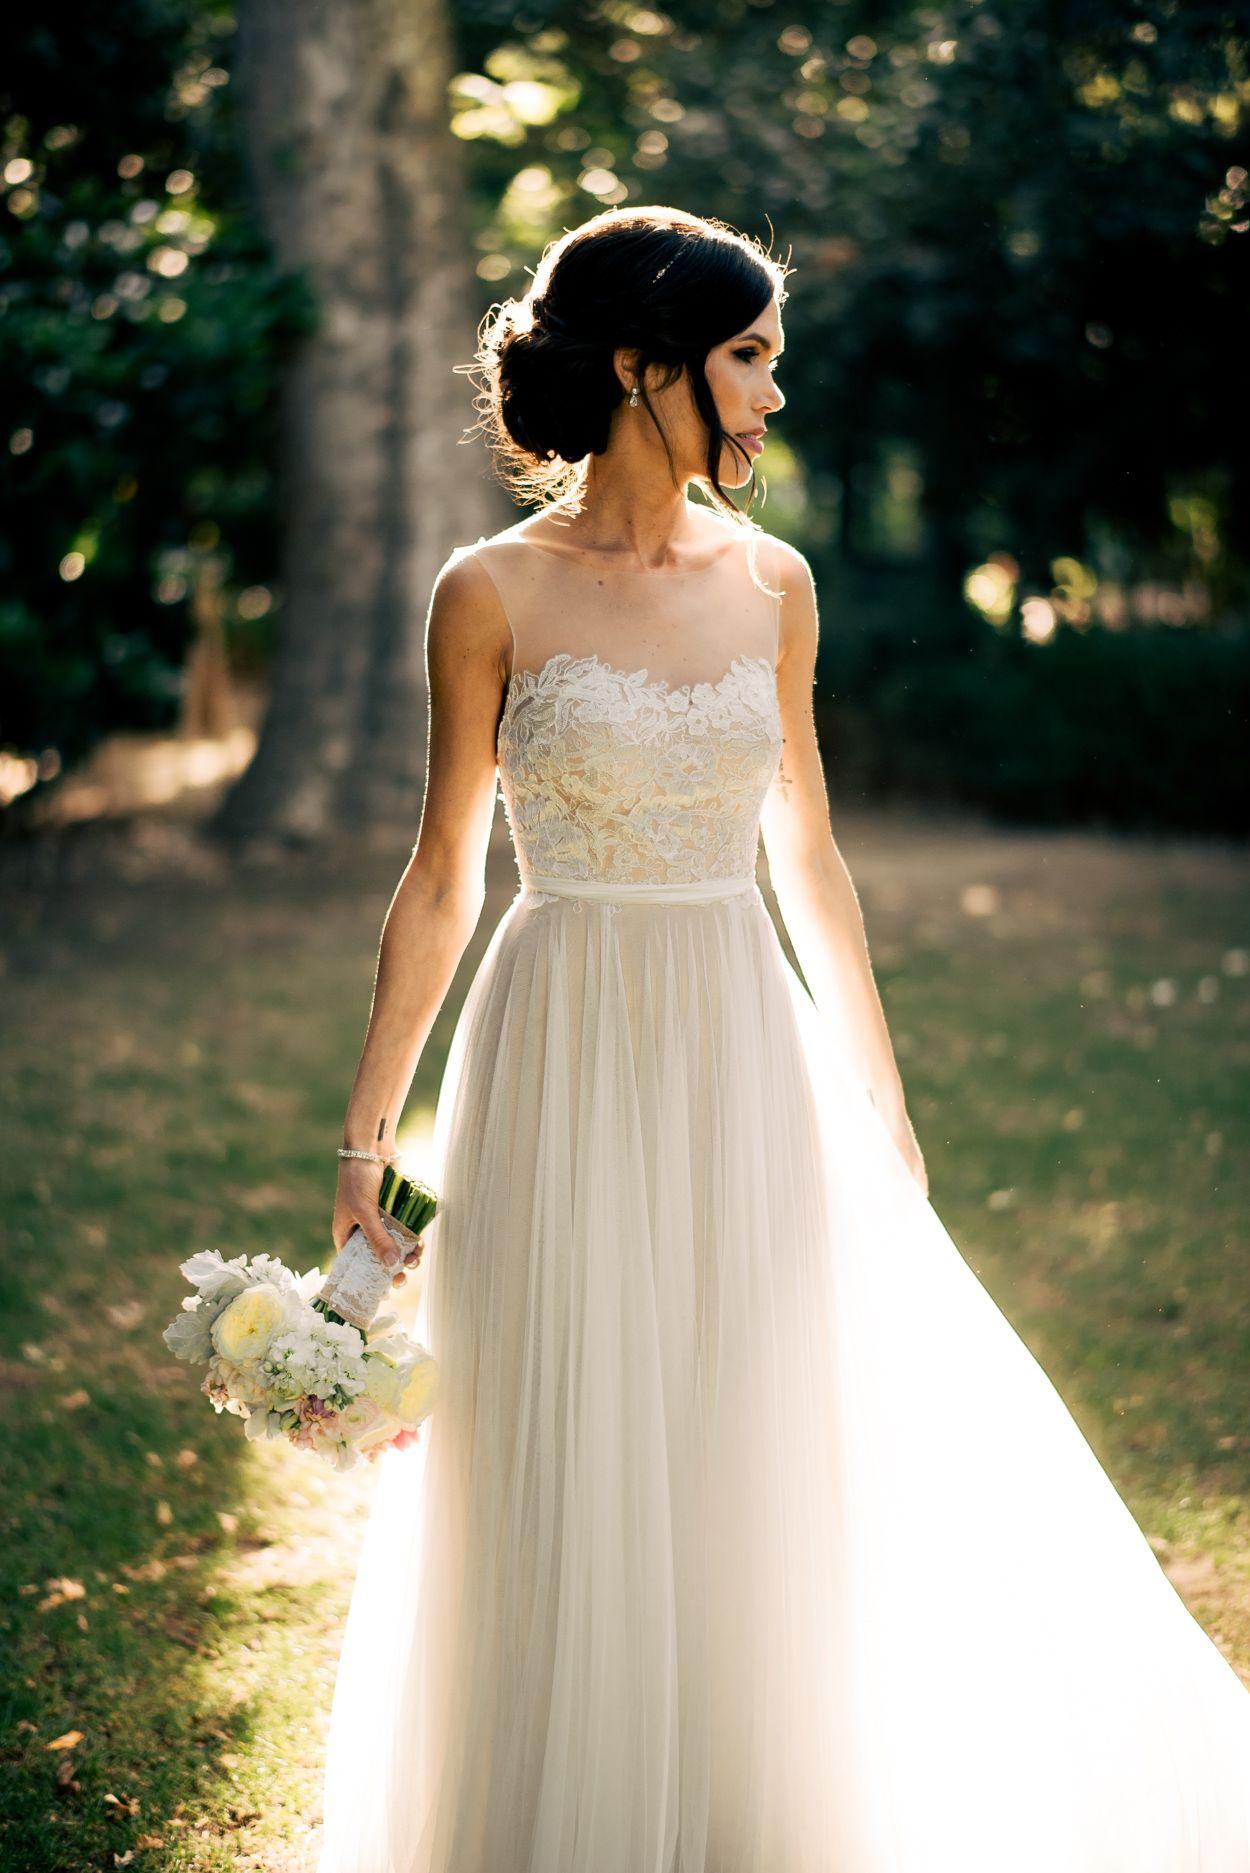 rsw-cory_katie-blog-39 | Hochzeitskleid | Pinterest | Los angeles ...